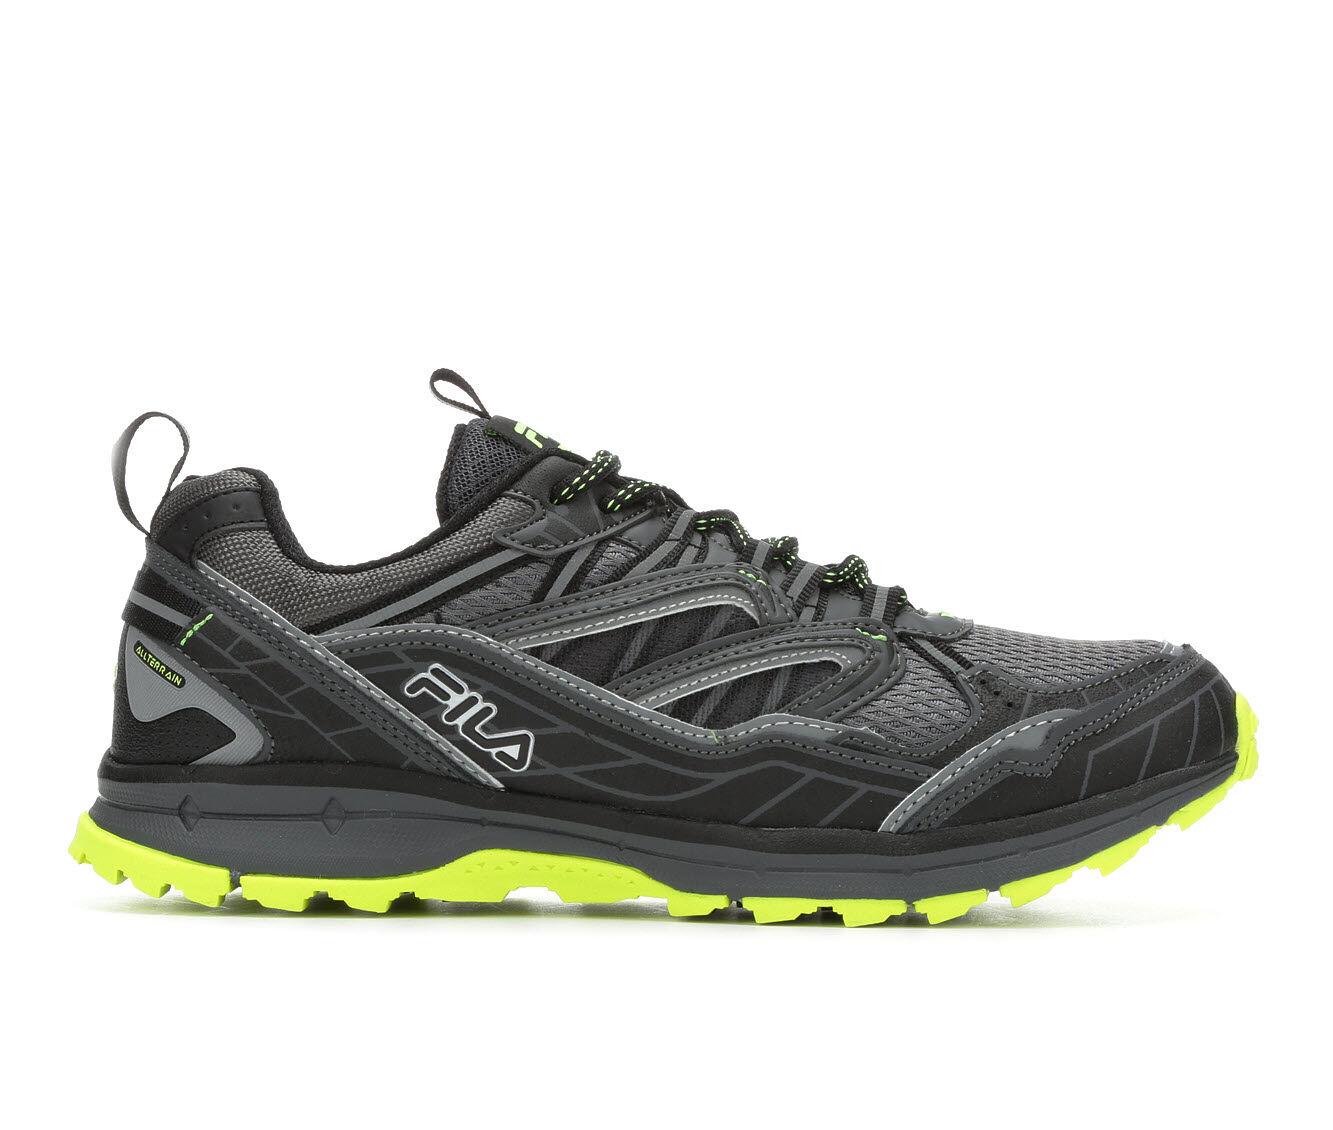 In Stock Men's Fila TKO TR 7.0 Trail Running Shoes Blk/Vlt/Gry